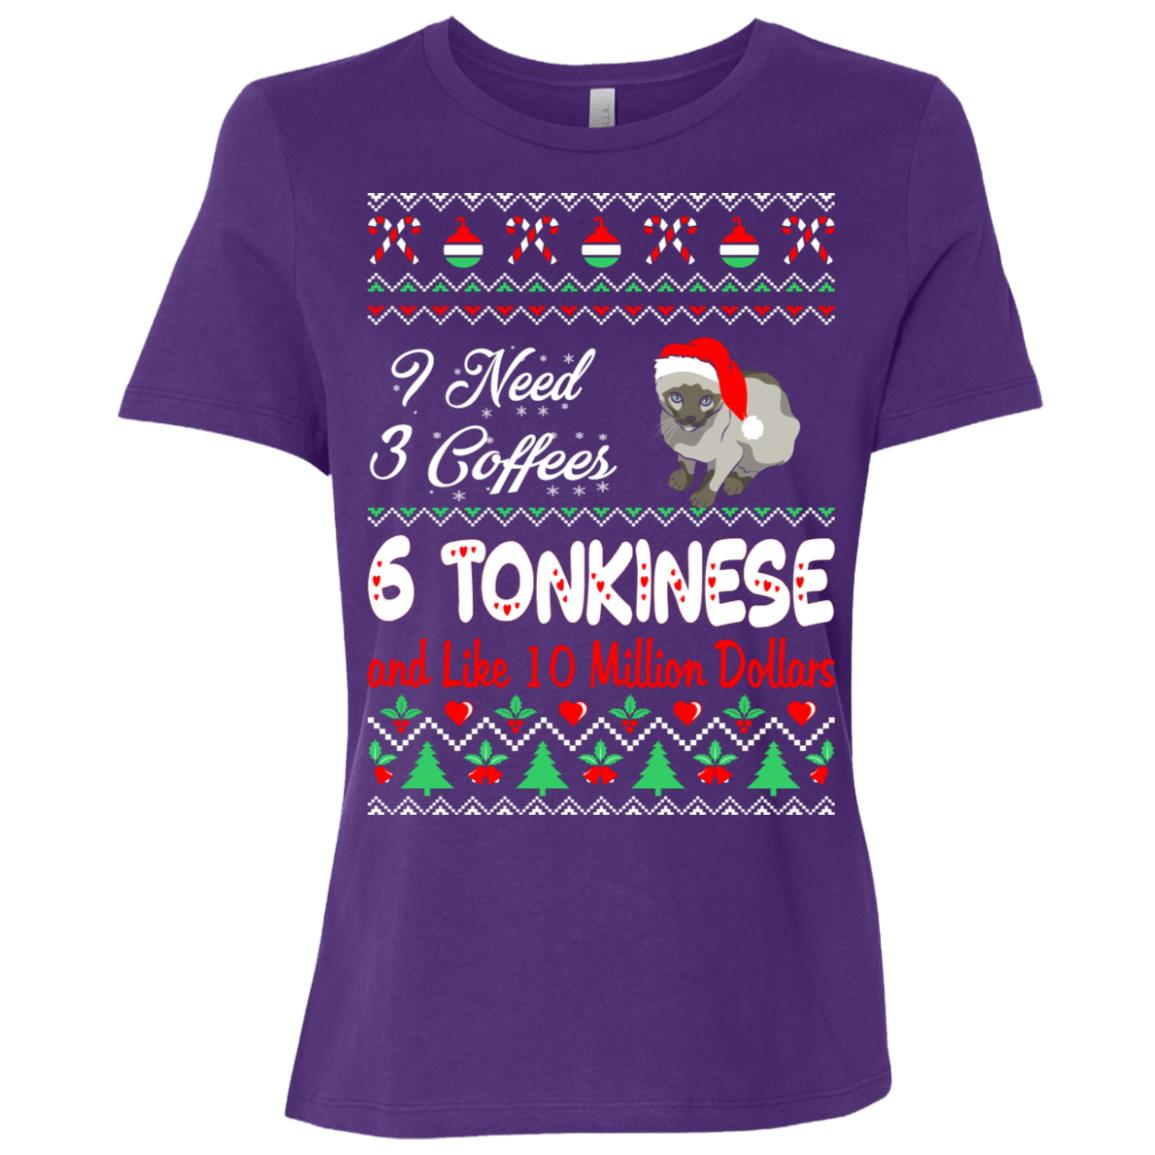 Need 3 Coffees 6 Tonkinese Christmas Ugly Sweater Women Short Sleeve T-Shirt